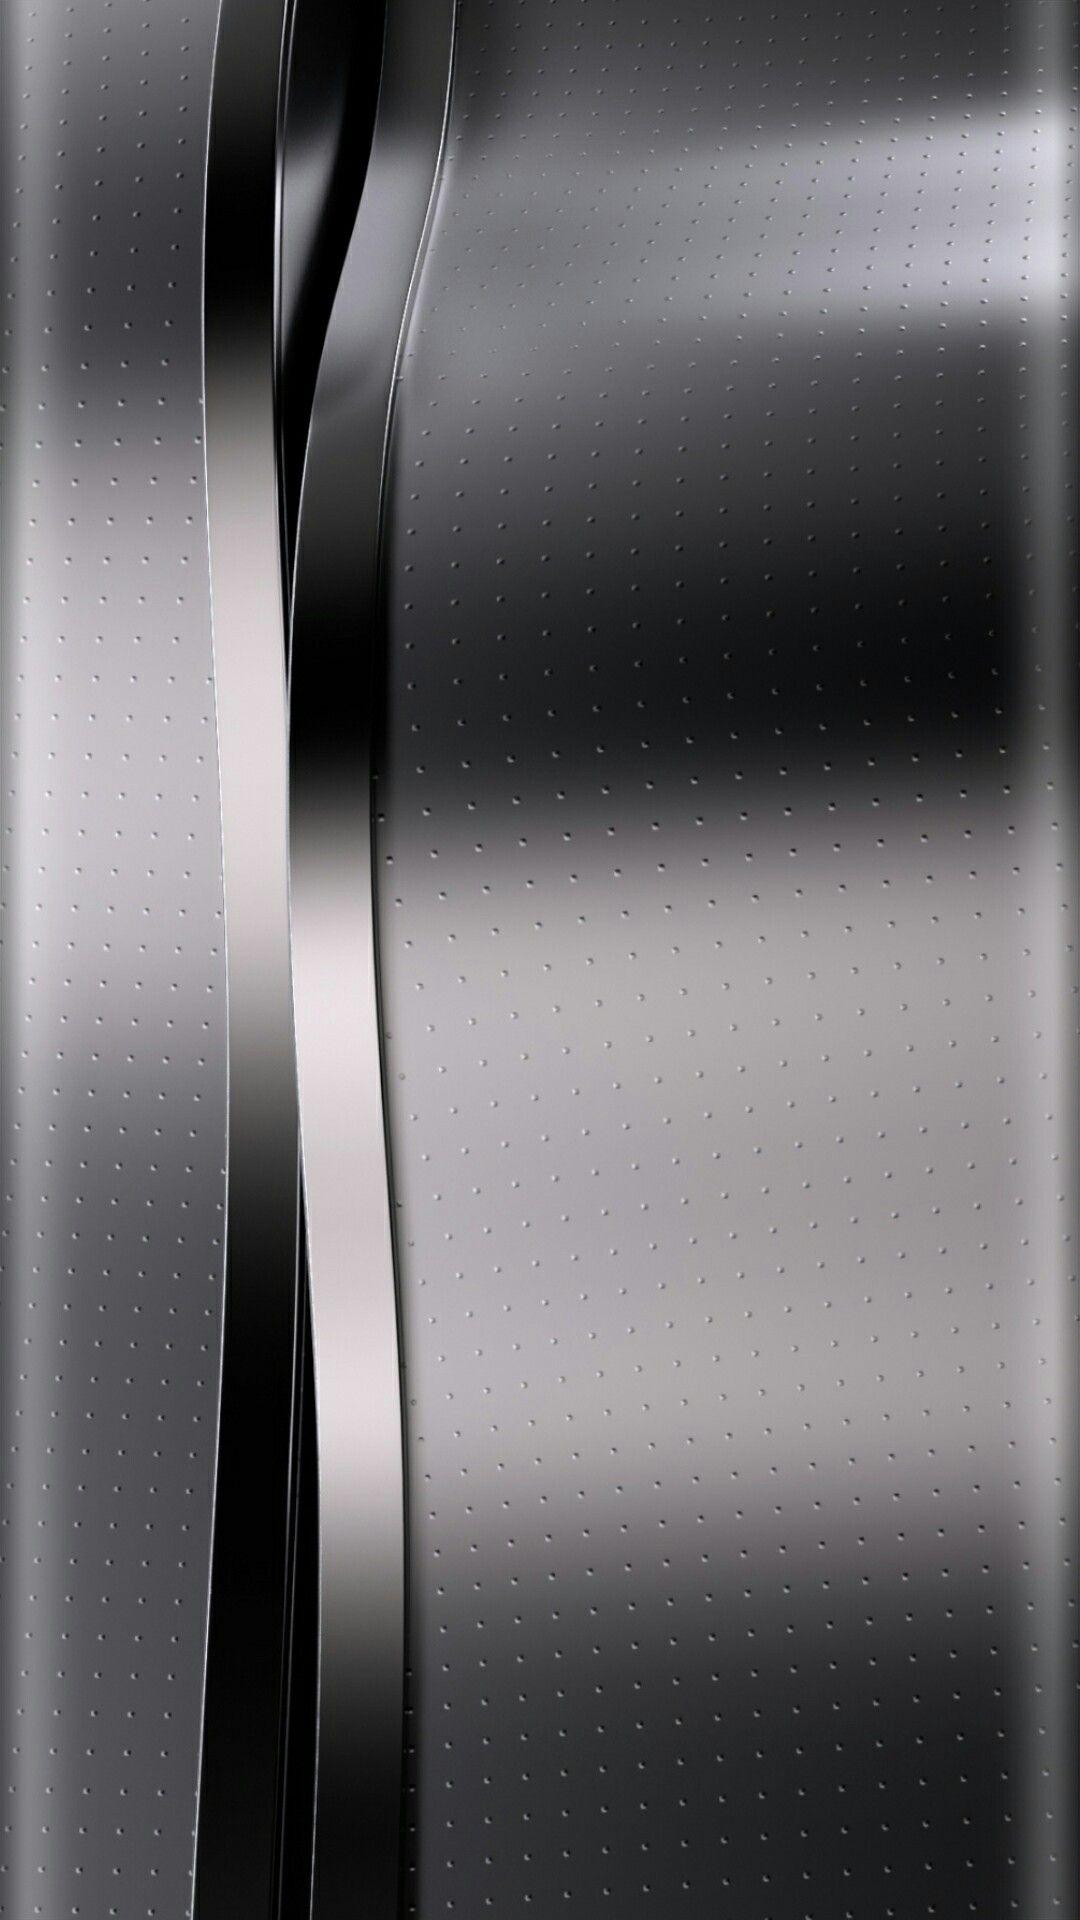 Silver And Black Chrome Wallpaper Silver Wallpaper Hd Samsung Wallpaper Wallpaper Edge